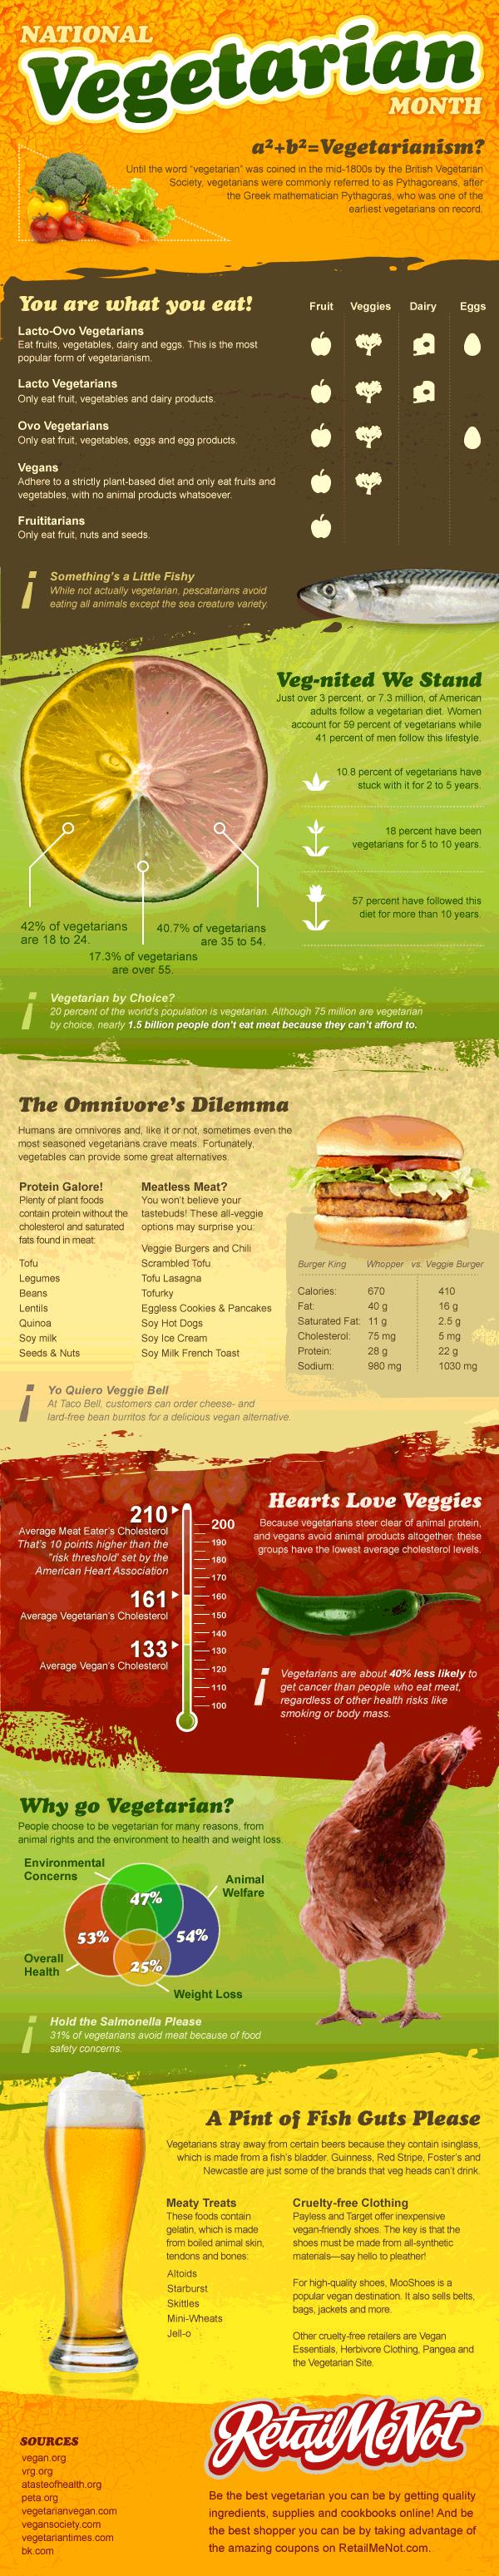 Vegetarian Consumption Facts